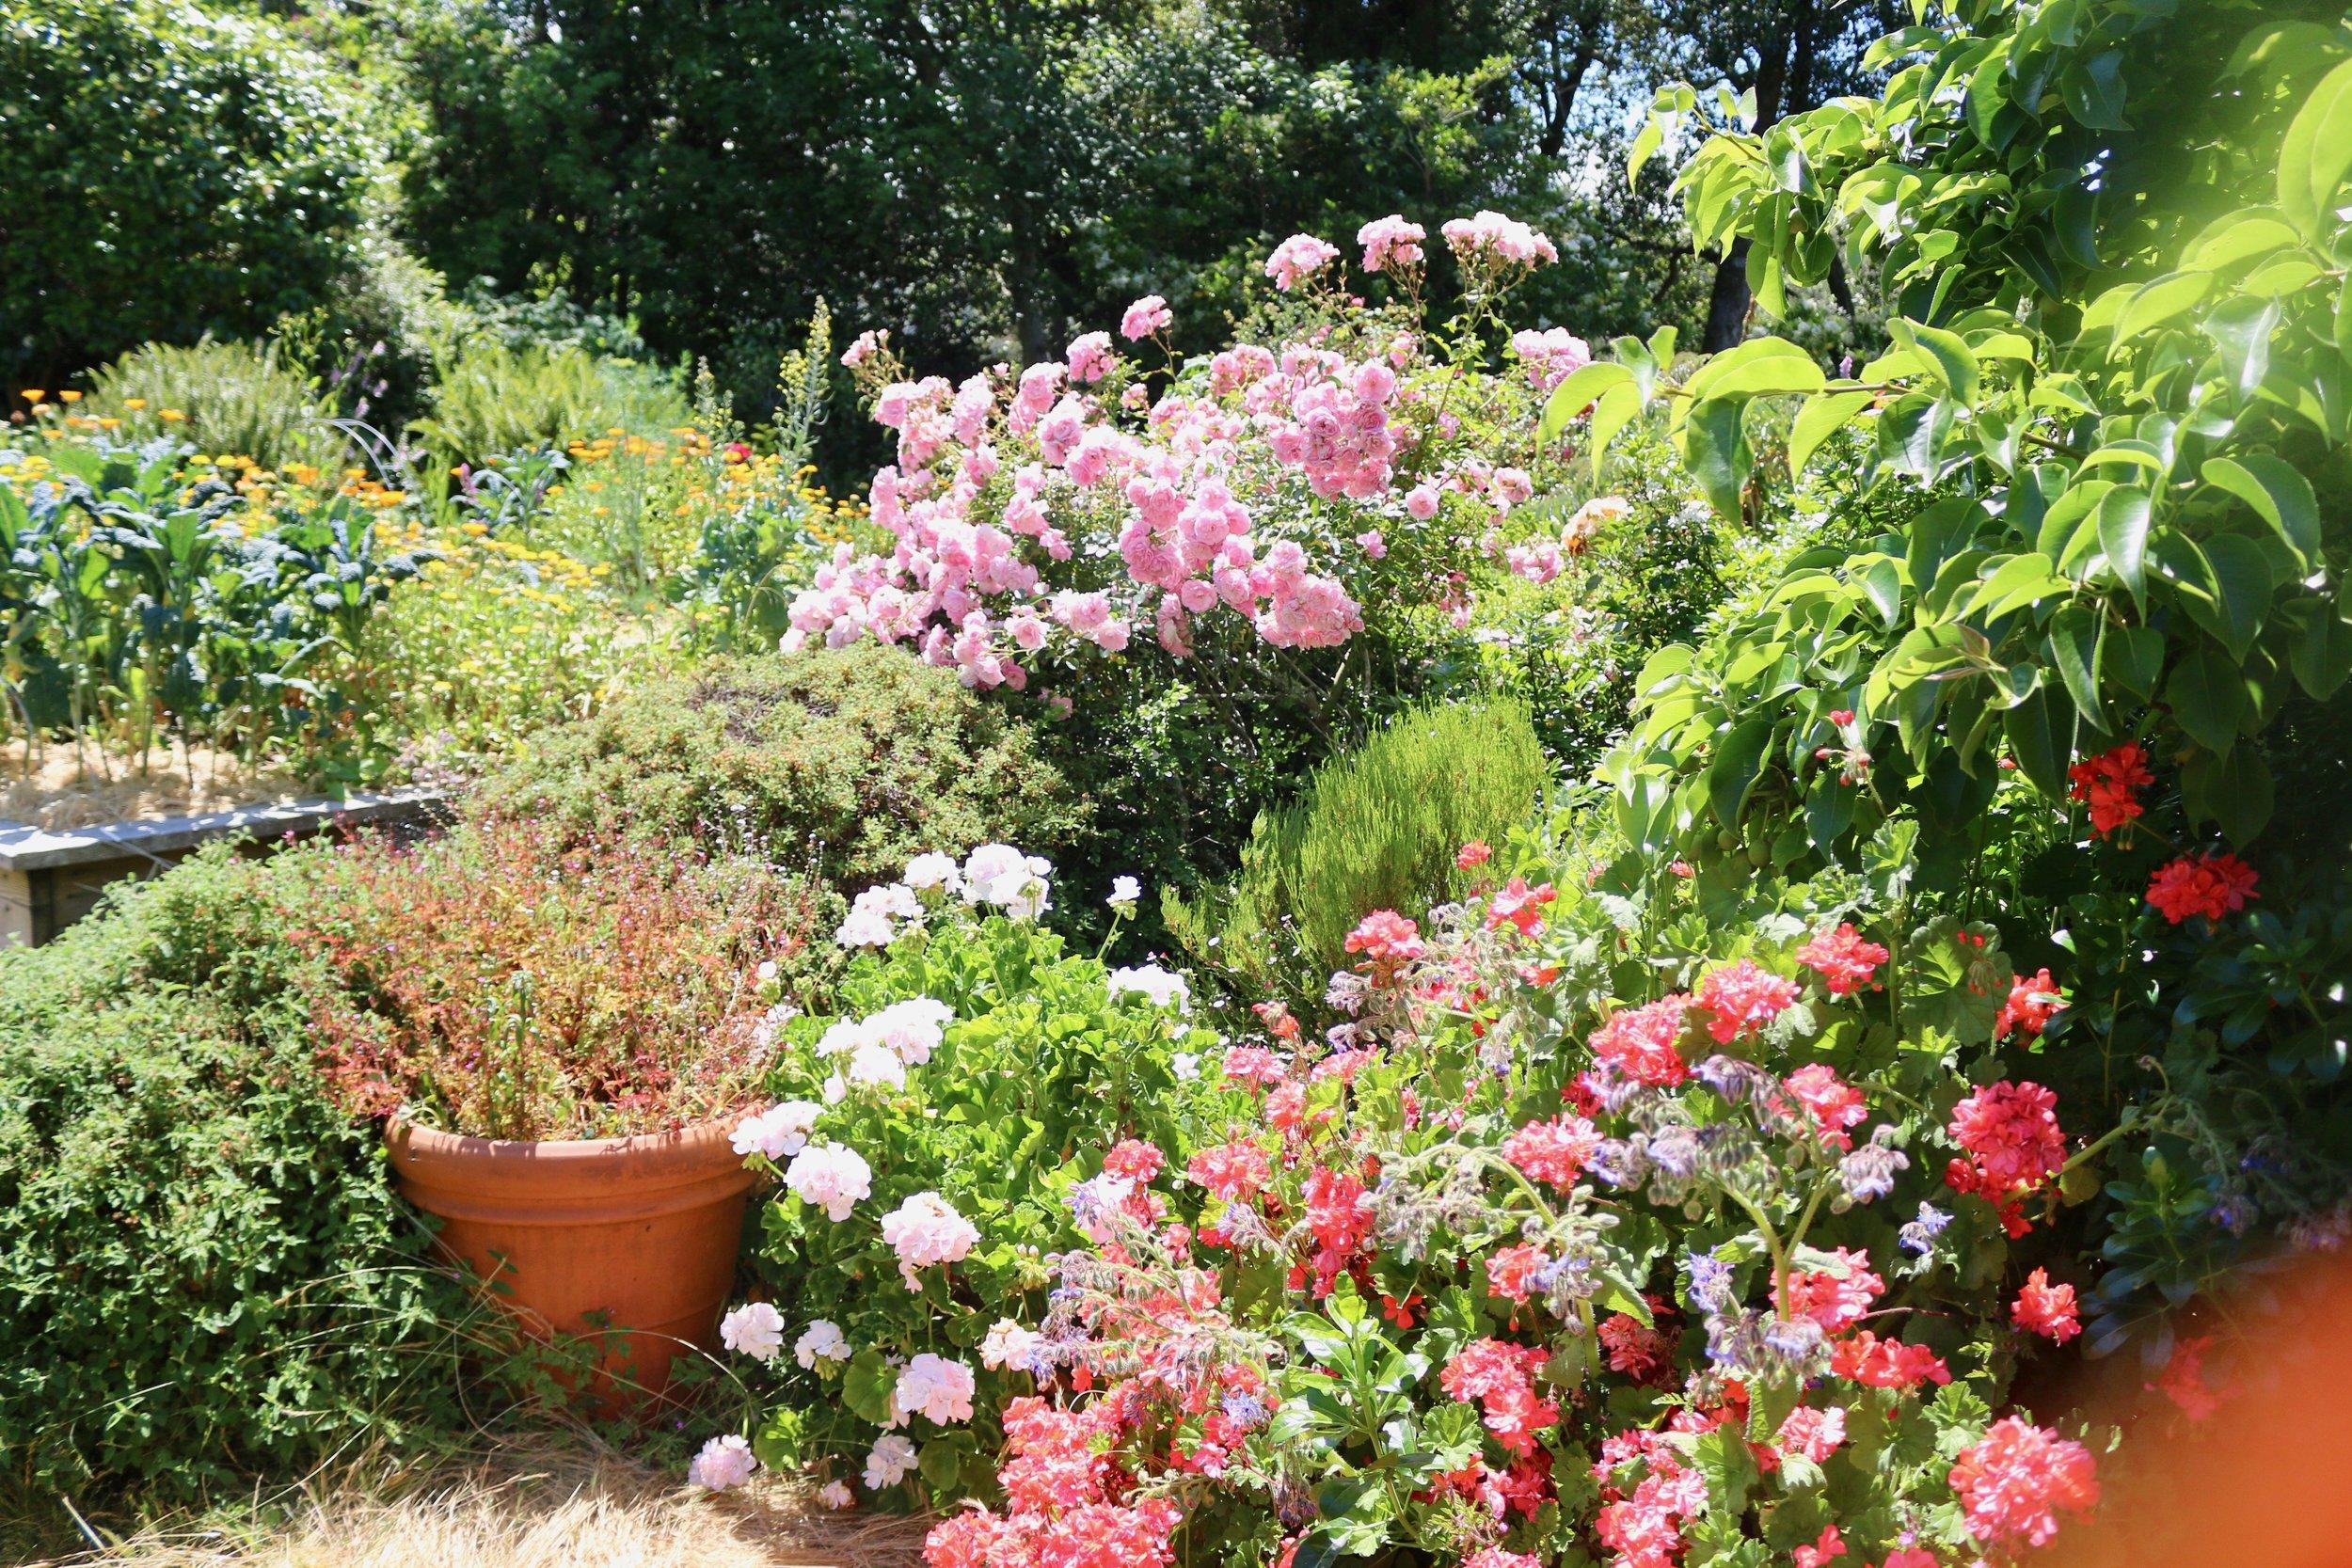 Flowers in the Eco-Refuge back garden. Photo by Sim Van der Ryn.